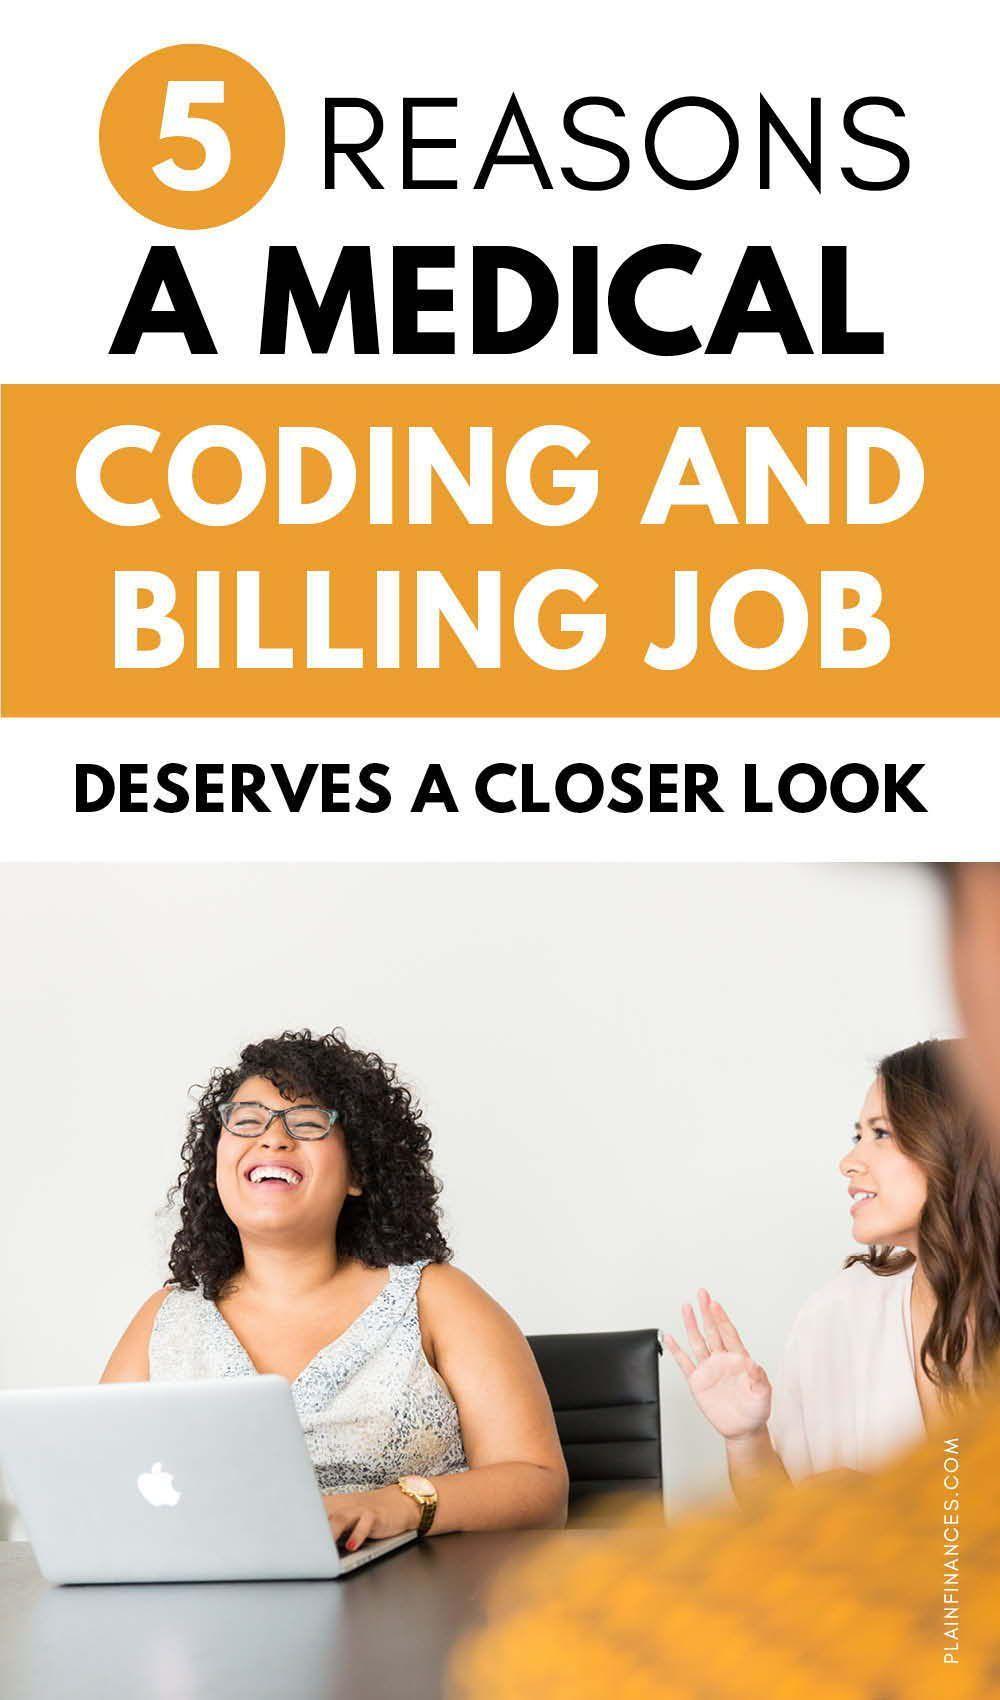 248703777748d6e72fdca6ef0f324de8 - How Hard Is It To Get A Medical Coding Job